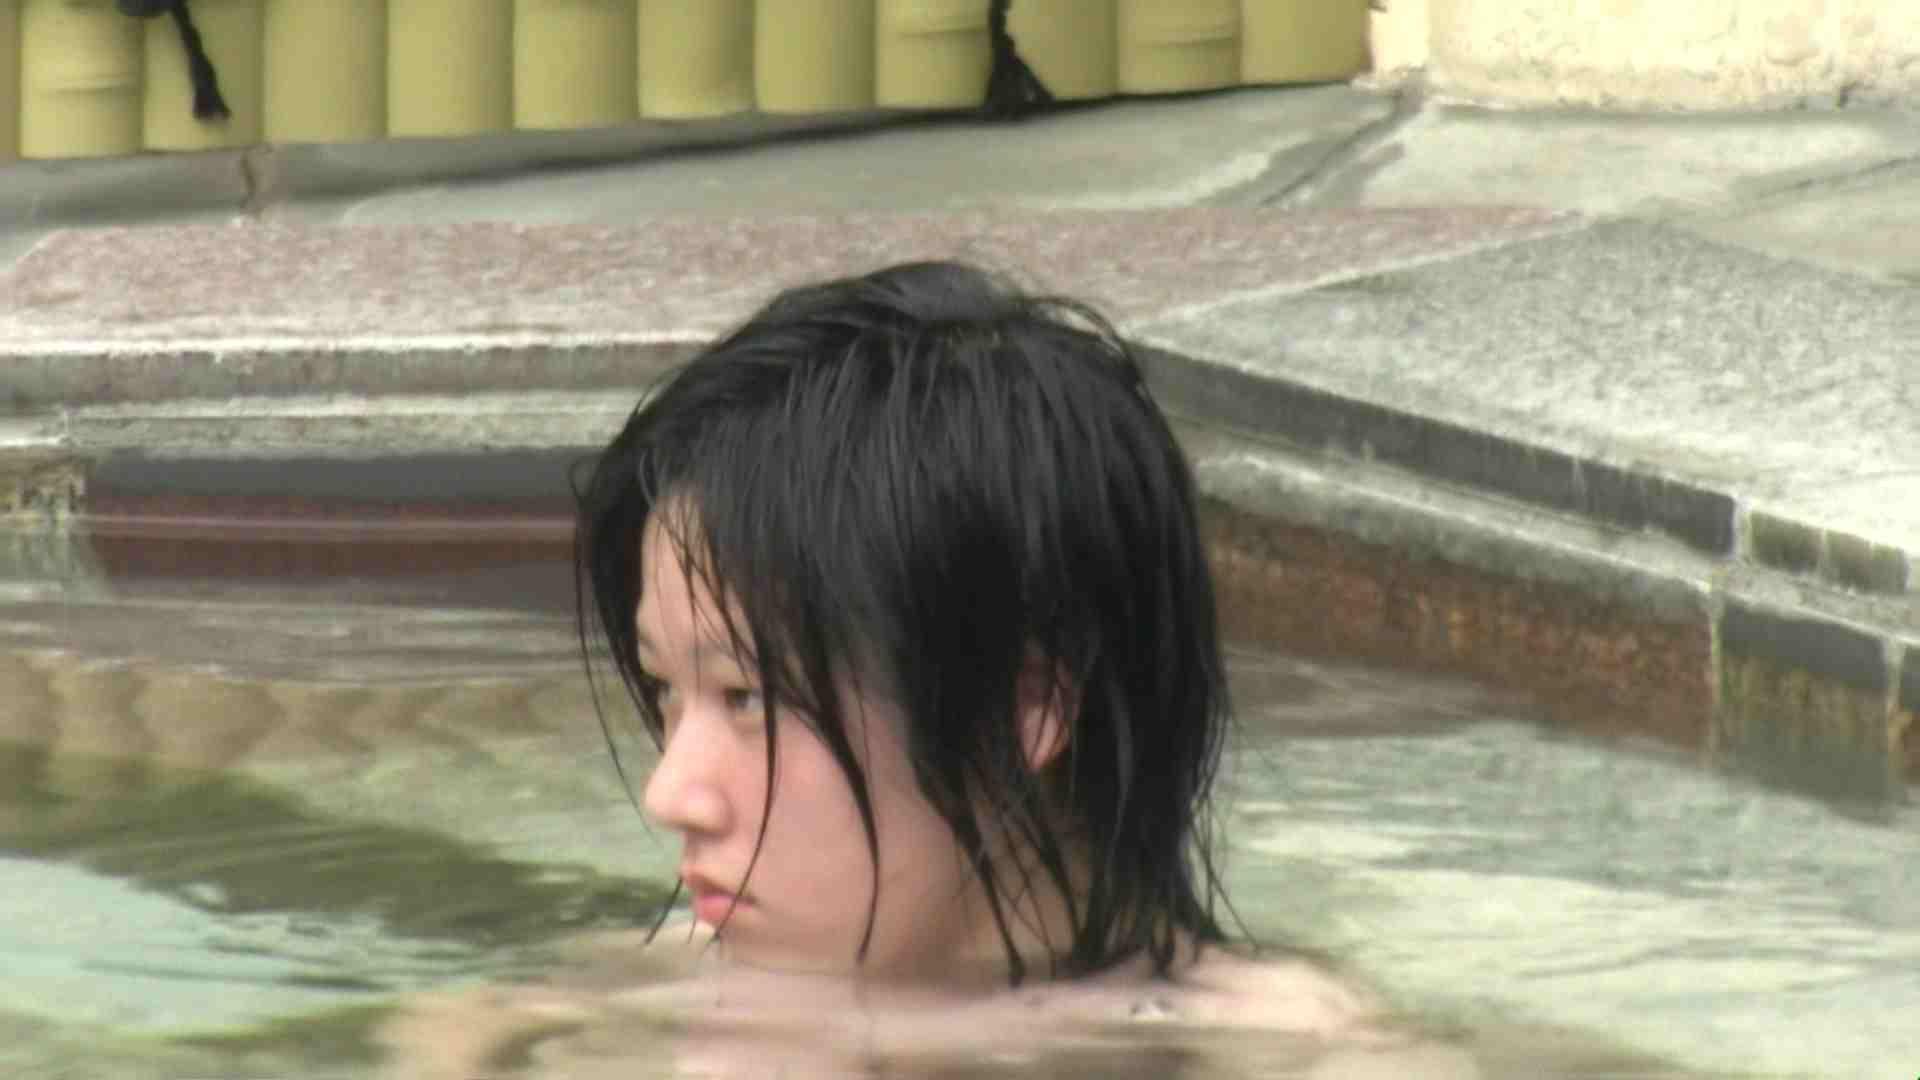 Aquaな露天風呂Vol.36 OL女体  78連発 75